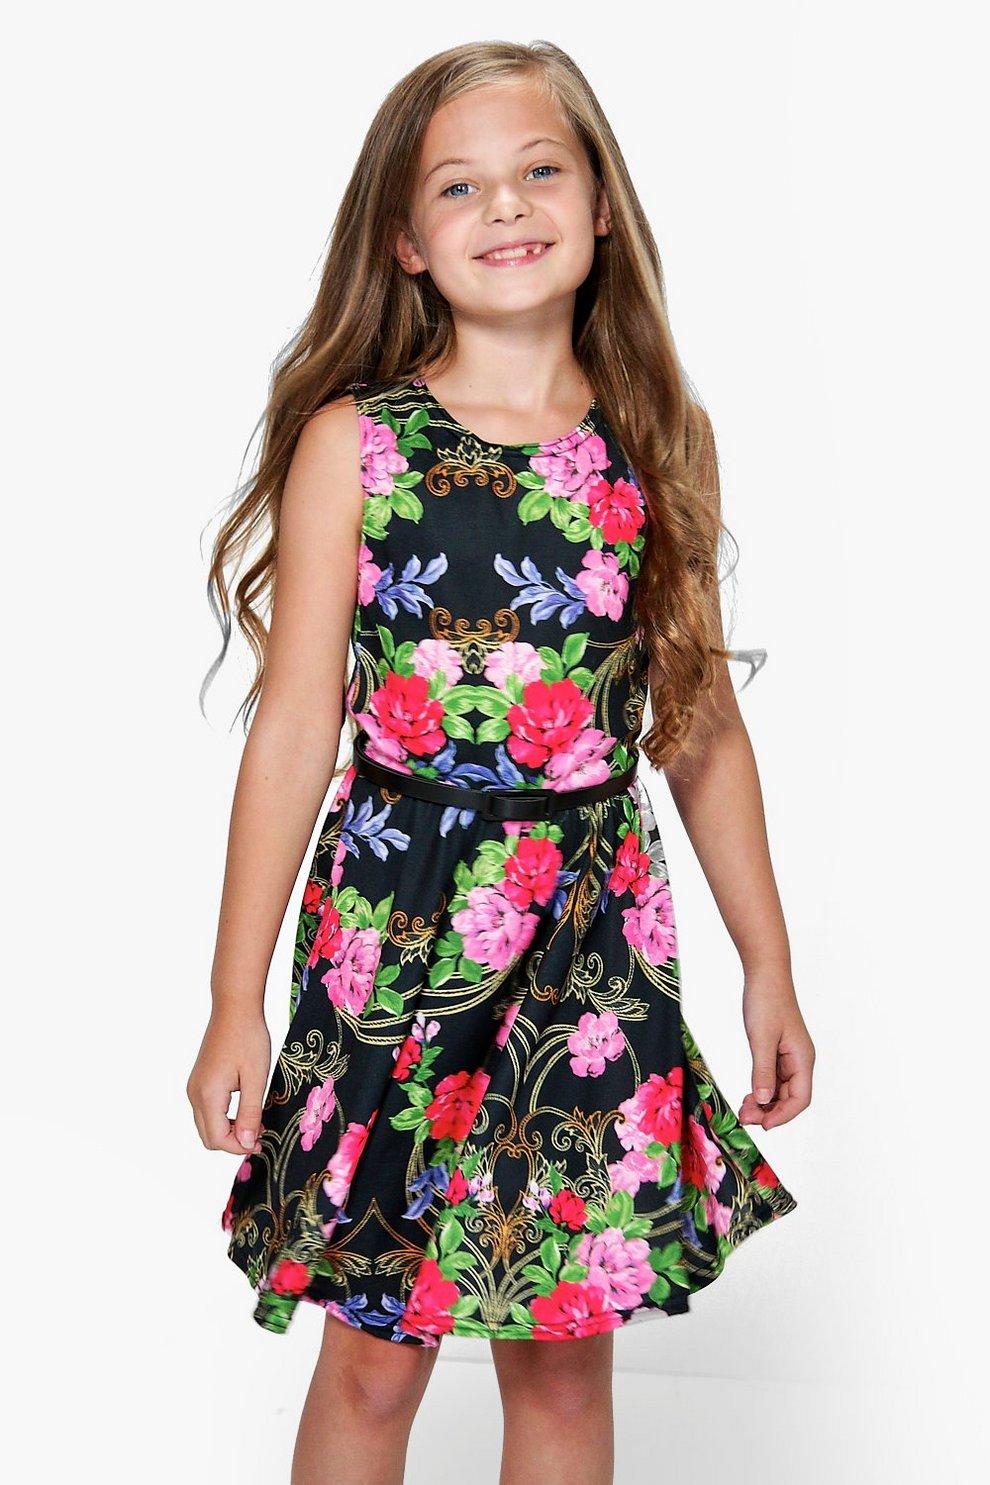 918c2c08b1 Girls Floral Full Circle Skater Dress